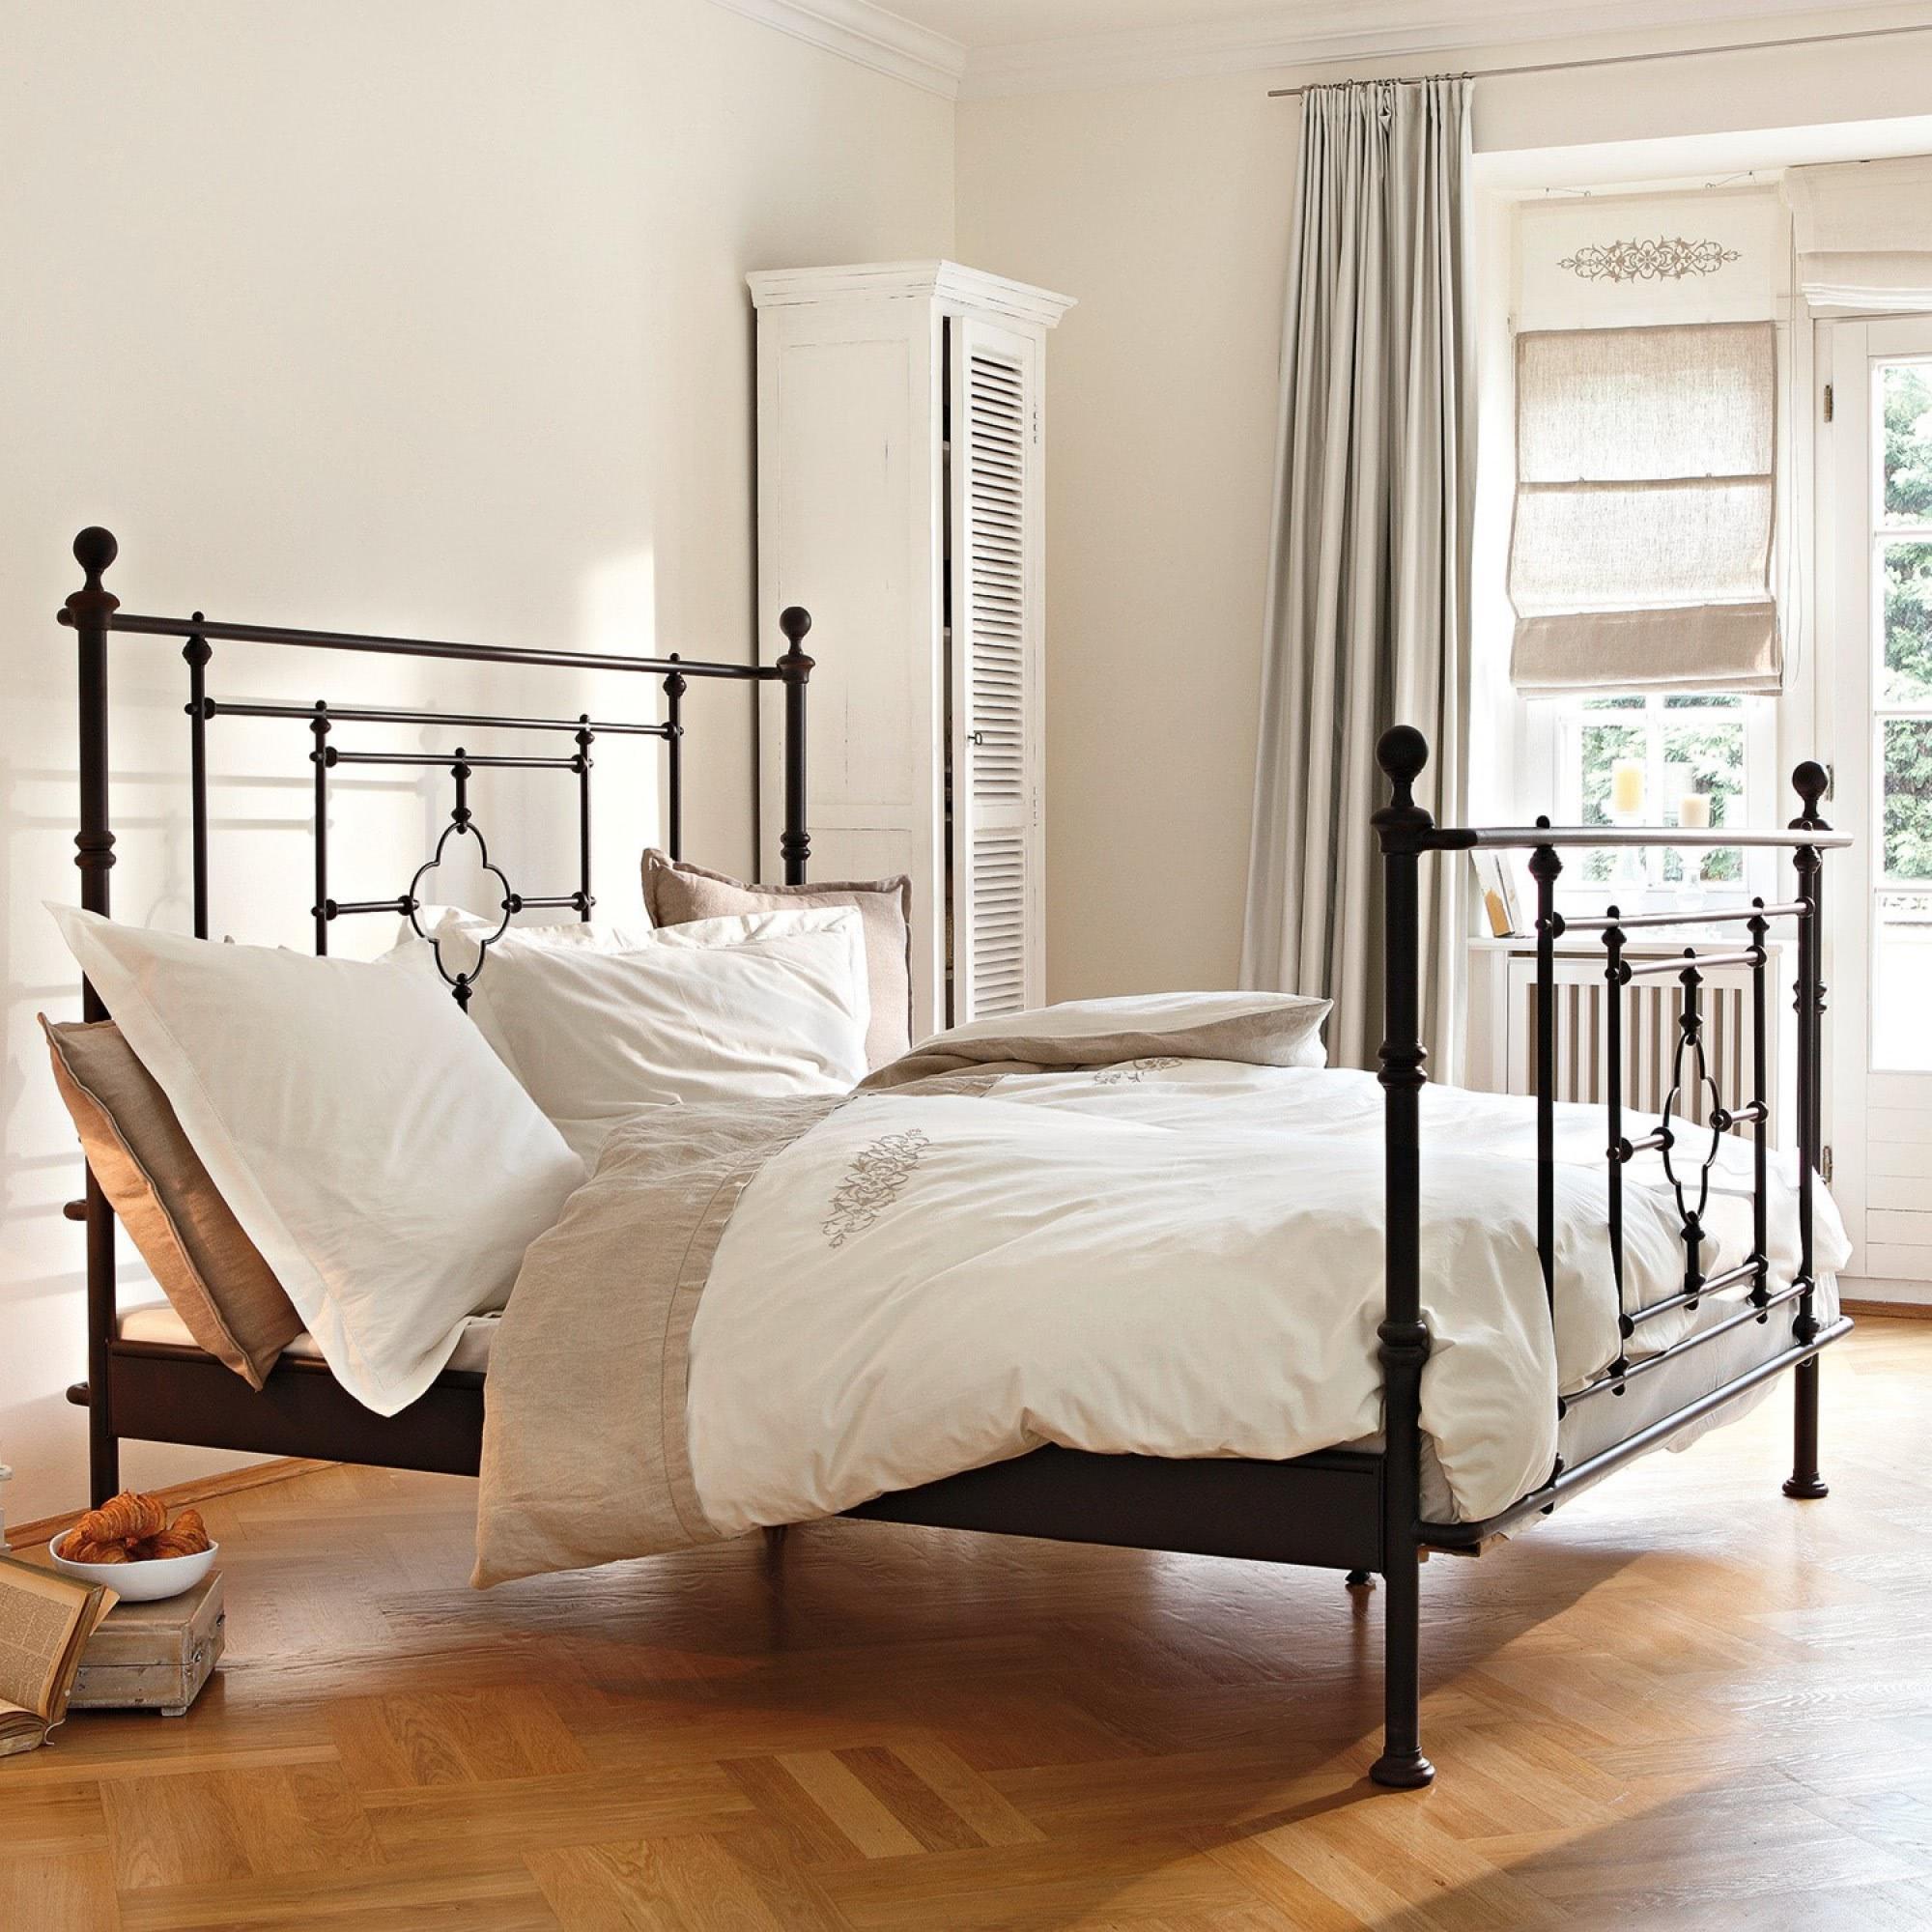 bettw sche colmar loberon coming home. Black Bedroom Furniture Sets. Home Design Ideas